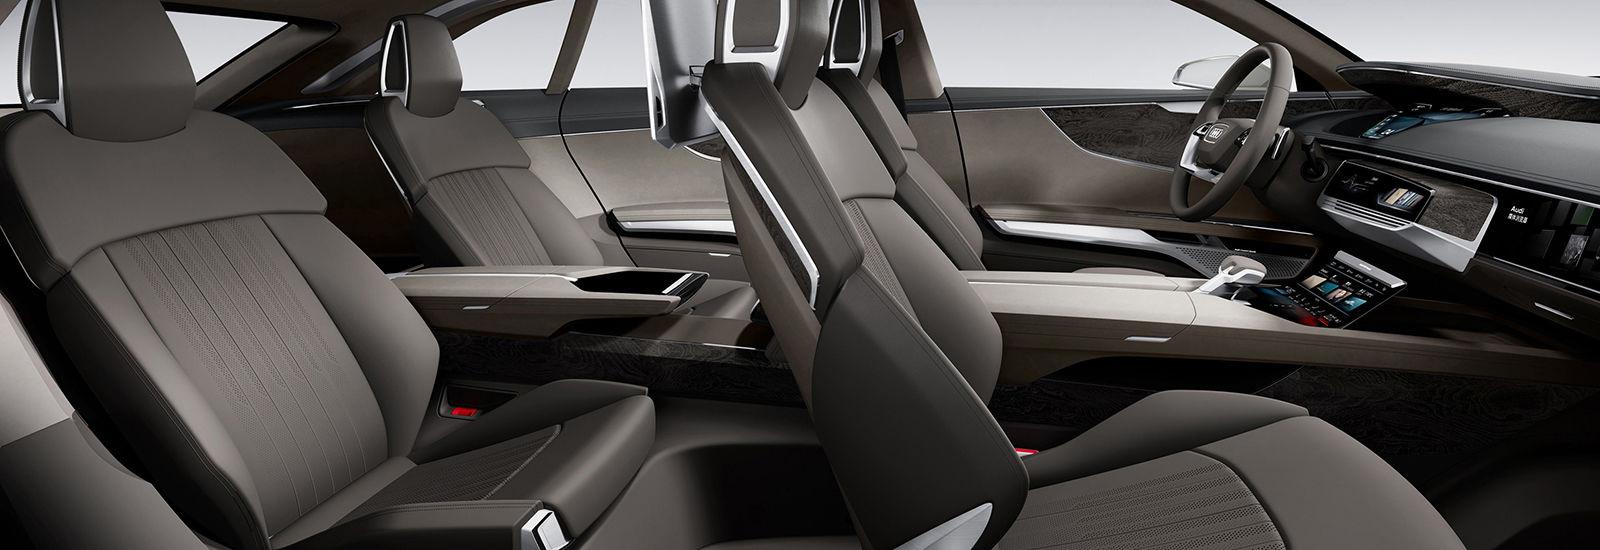 Audi A-9 e-tron Tesla Rival Interior View